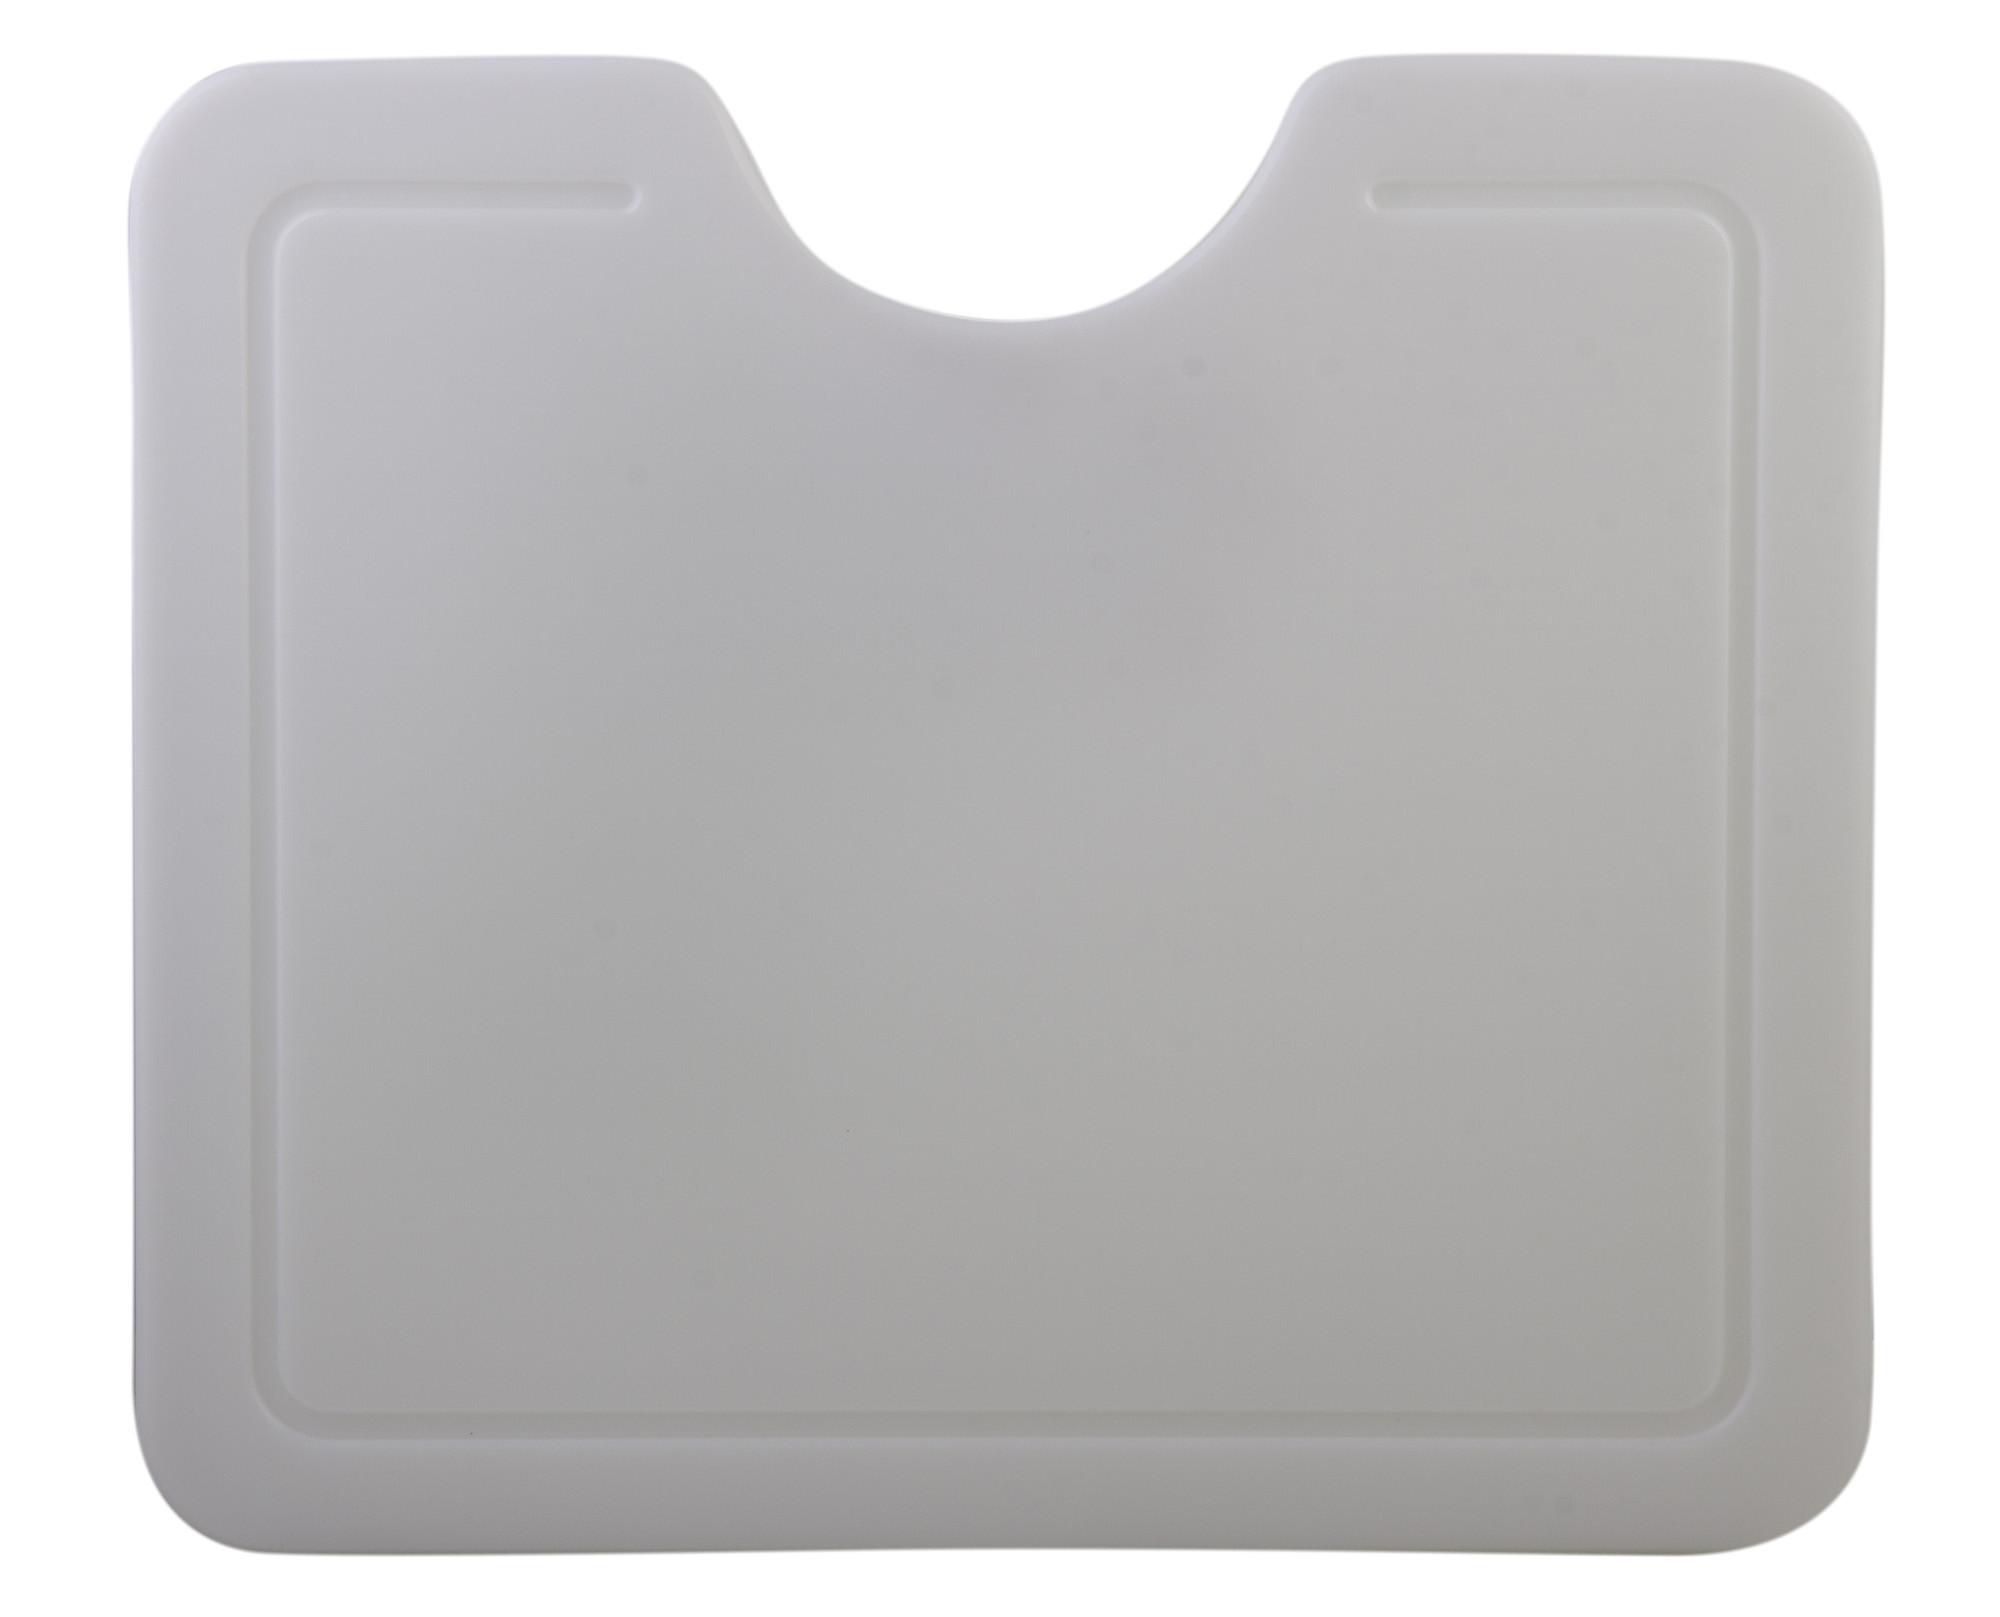 ALFI brand AB10PCB Rectangular Polyethylene Cutting Board for AB3020DI, AB2420DI, AB3420DI